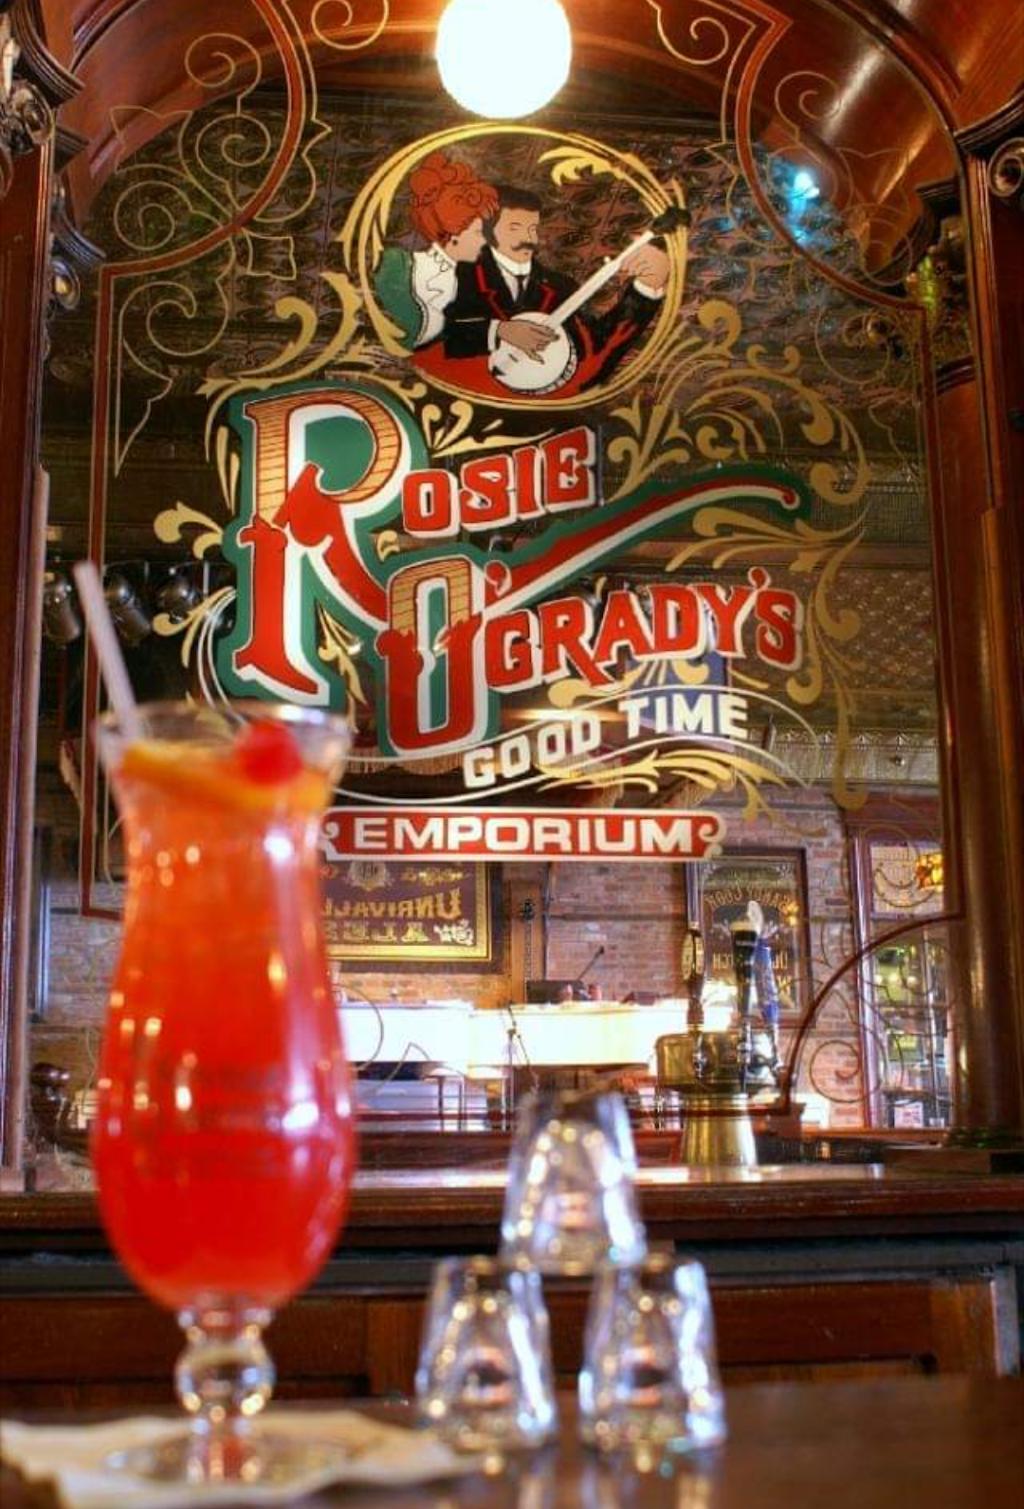 Rosie OGradys Inc | night club | 130 E Government St, Pensacola, FL 32502, USA | 8504346211 OR +1 850-434-6211